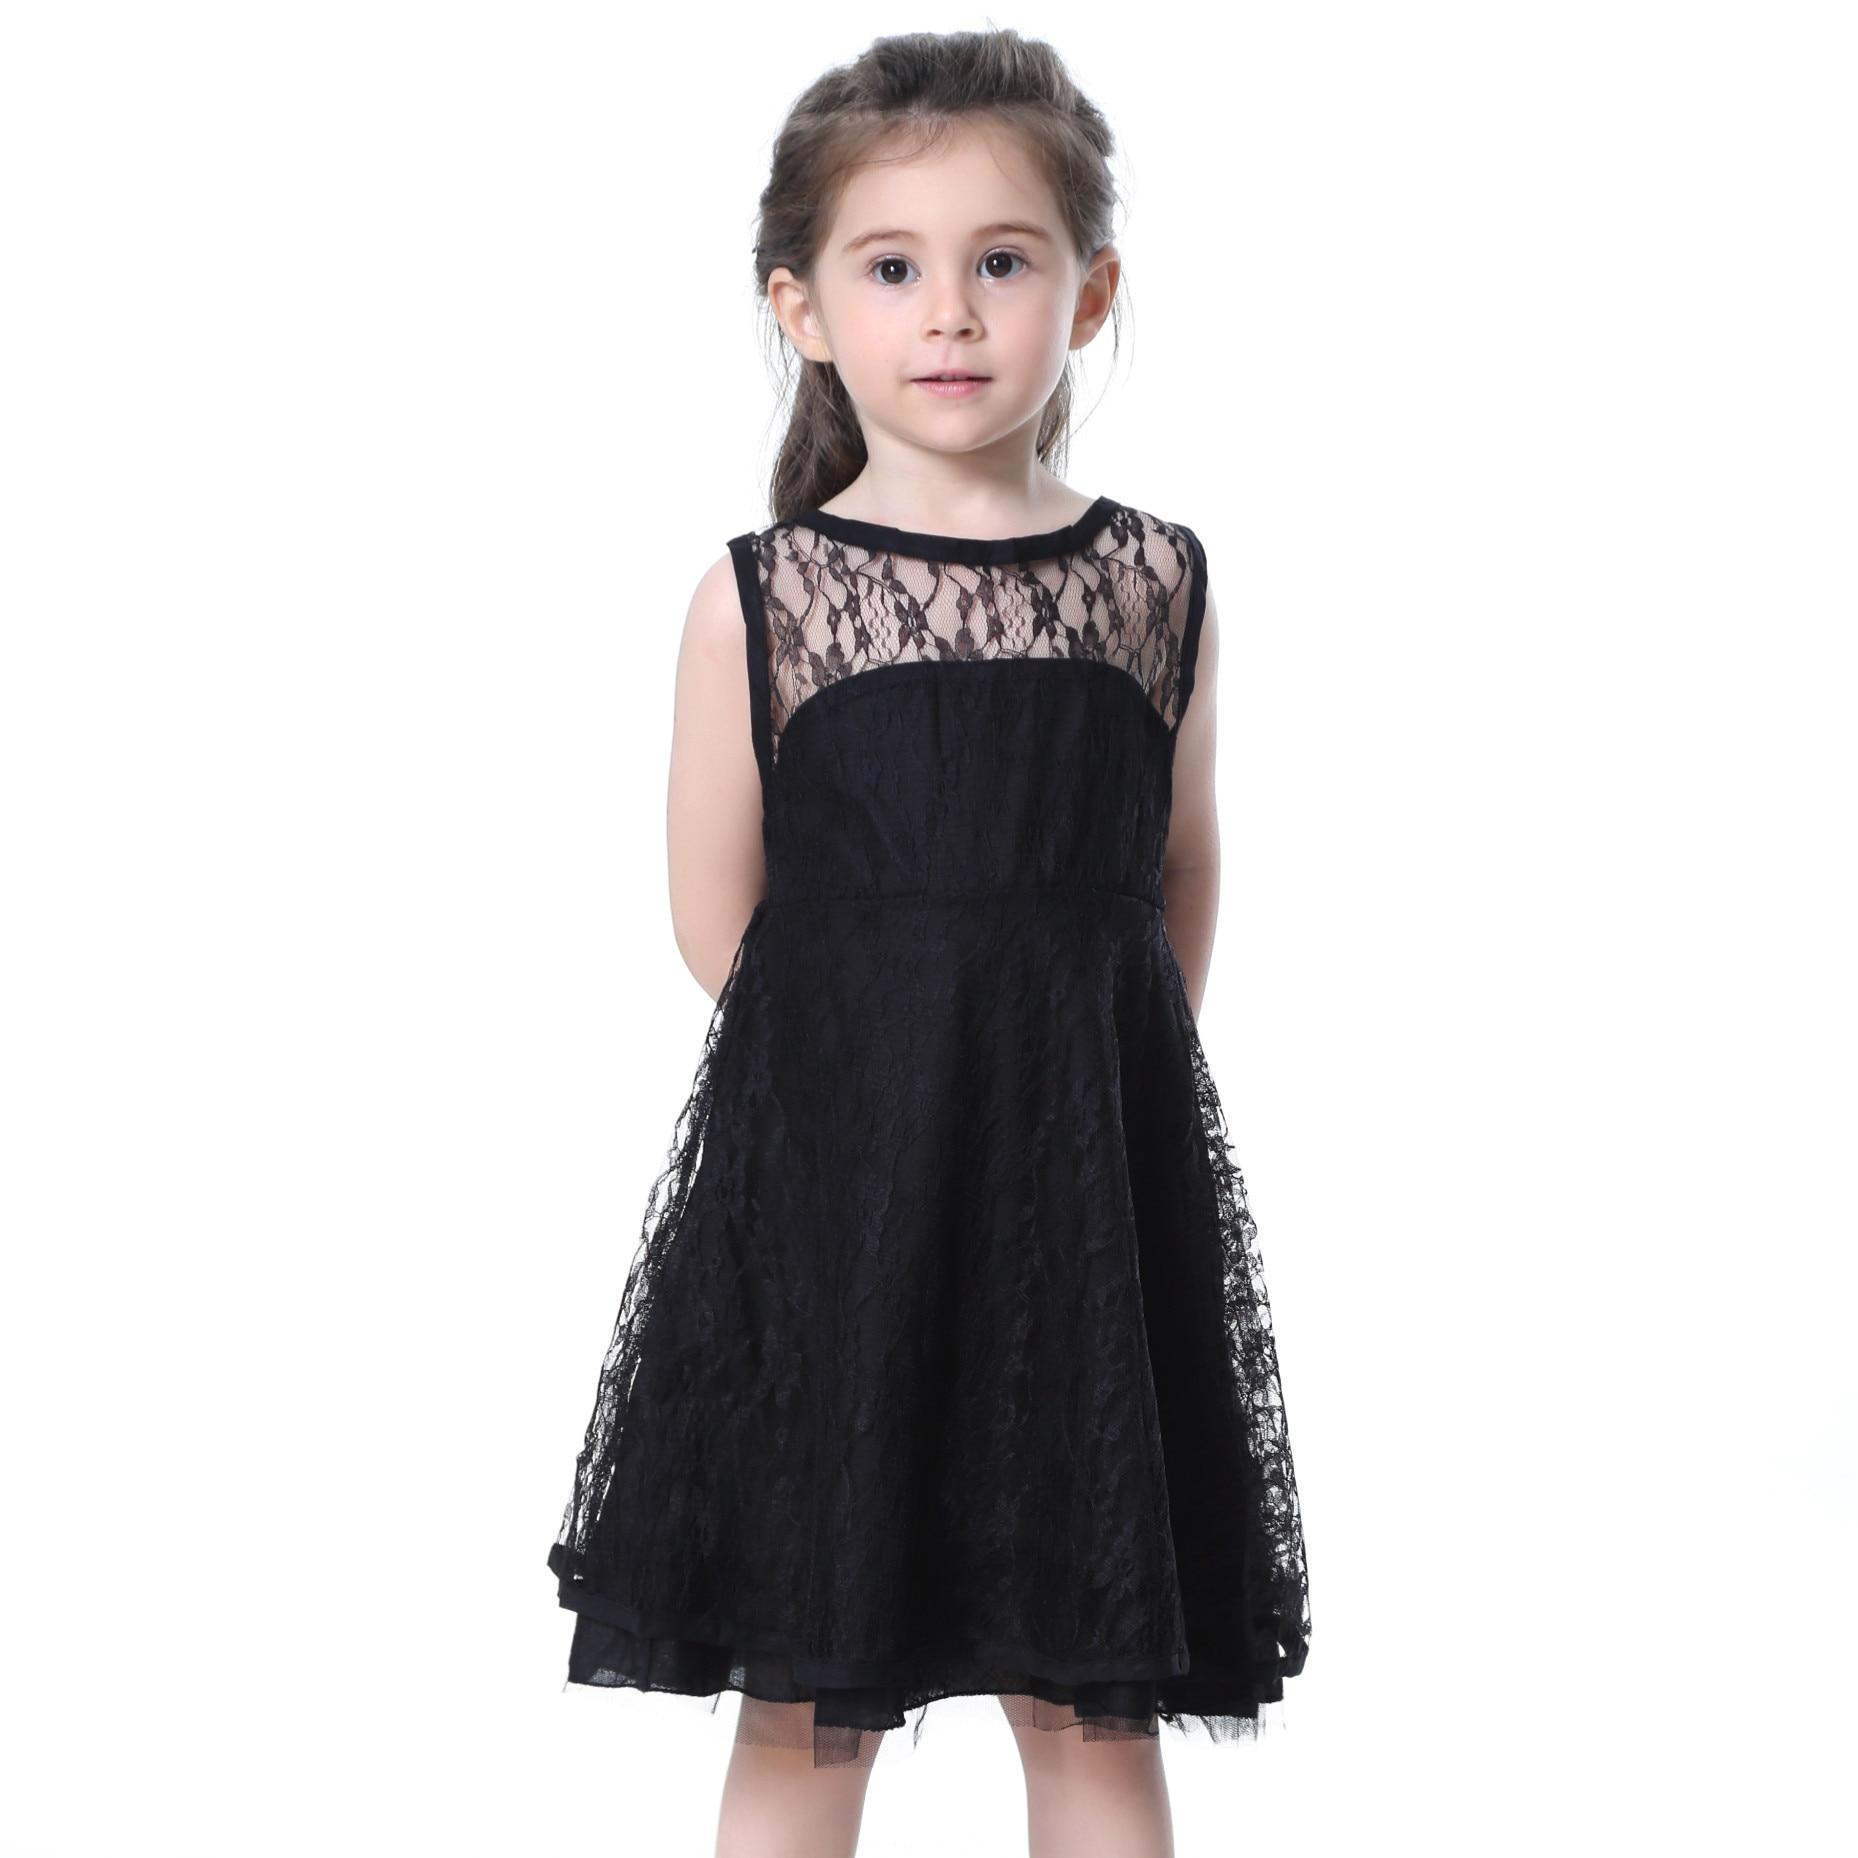 Black dress for baby girl - Fashion Baby Girls Black White Lace Dress Children Sleeveless A Line Princess Dress Summer Clothing